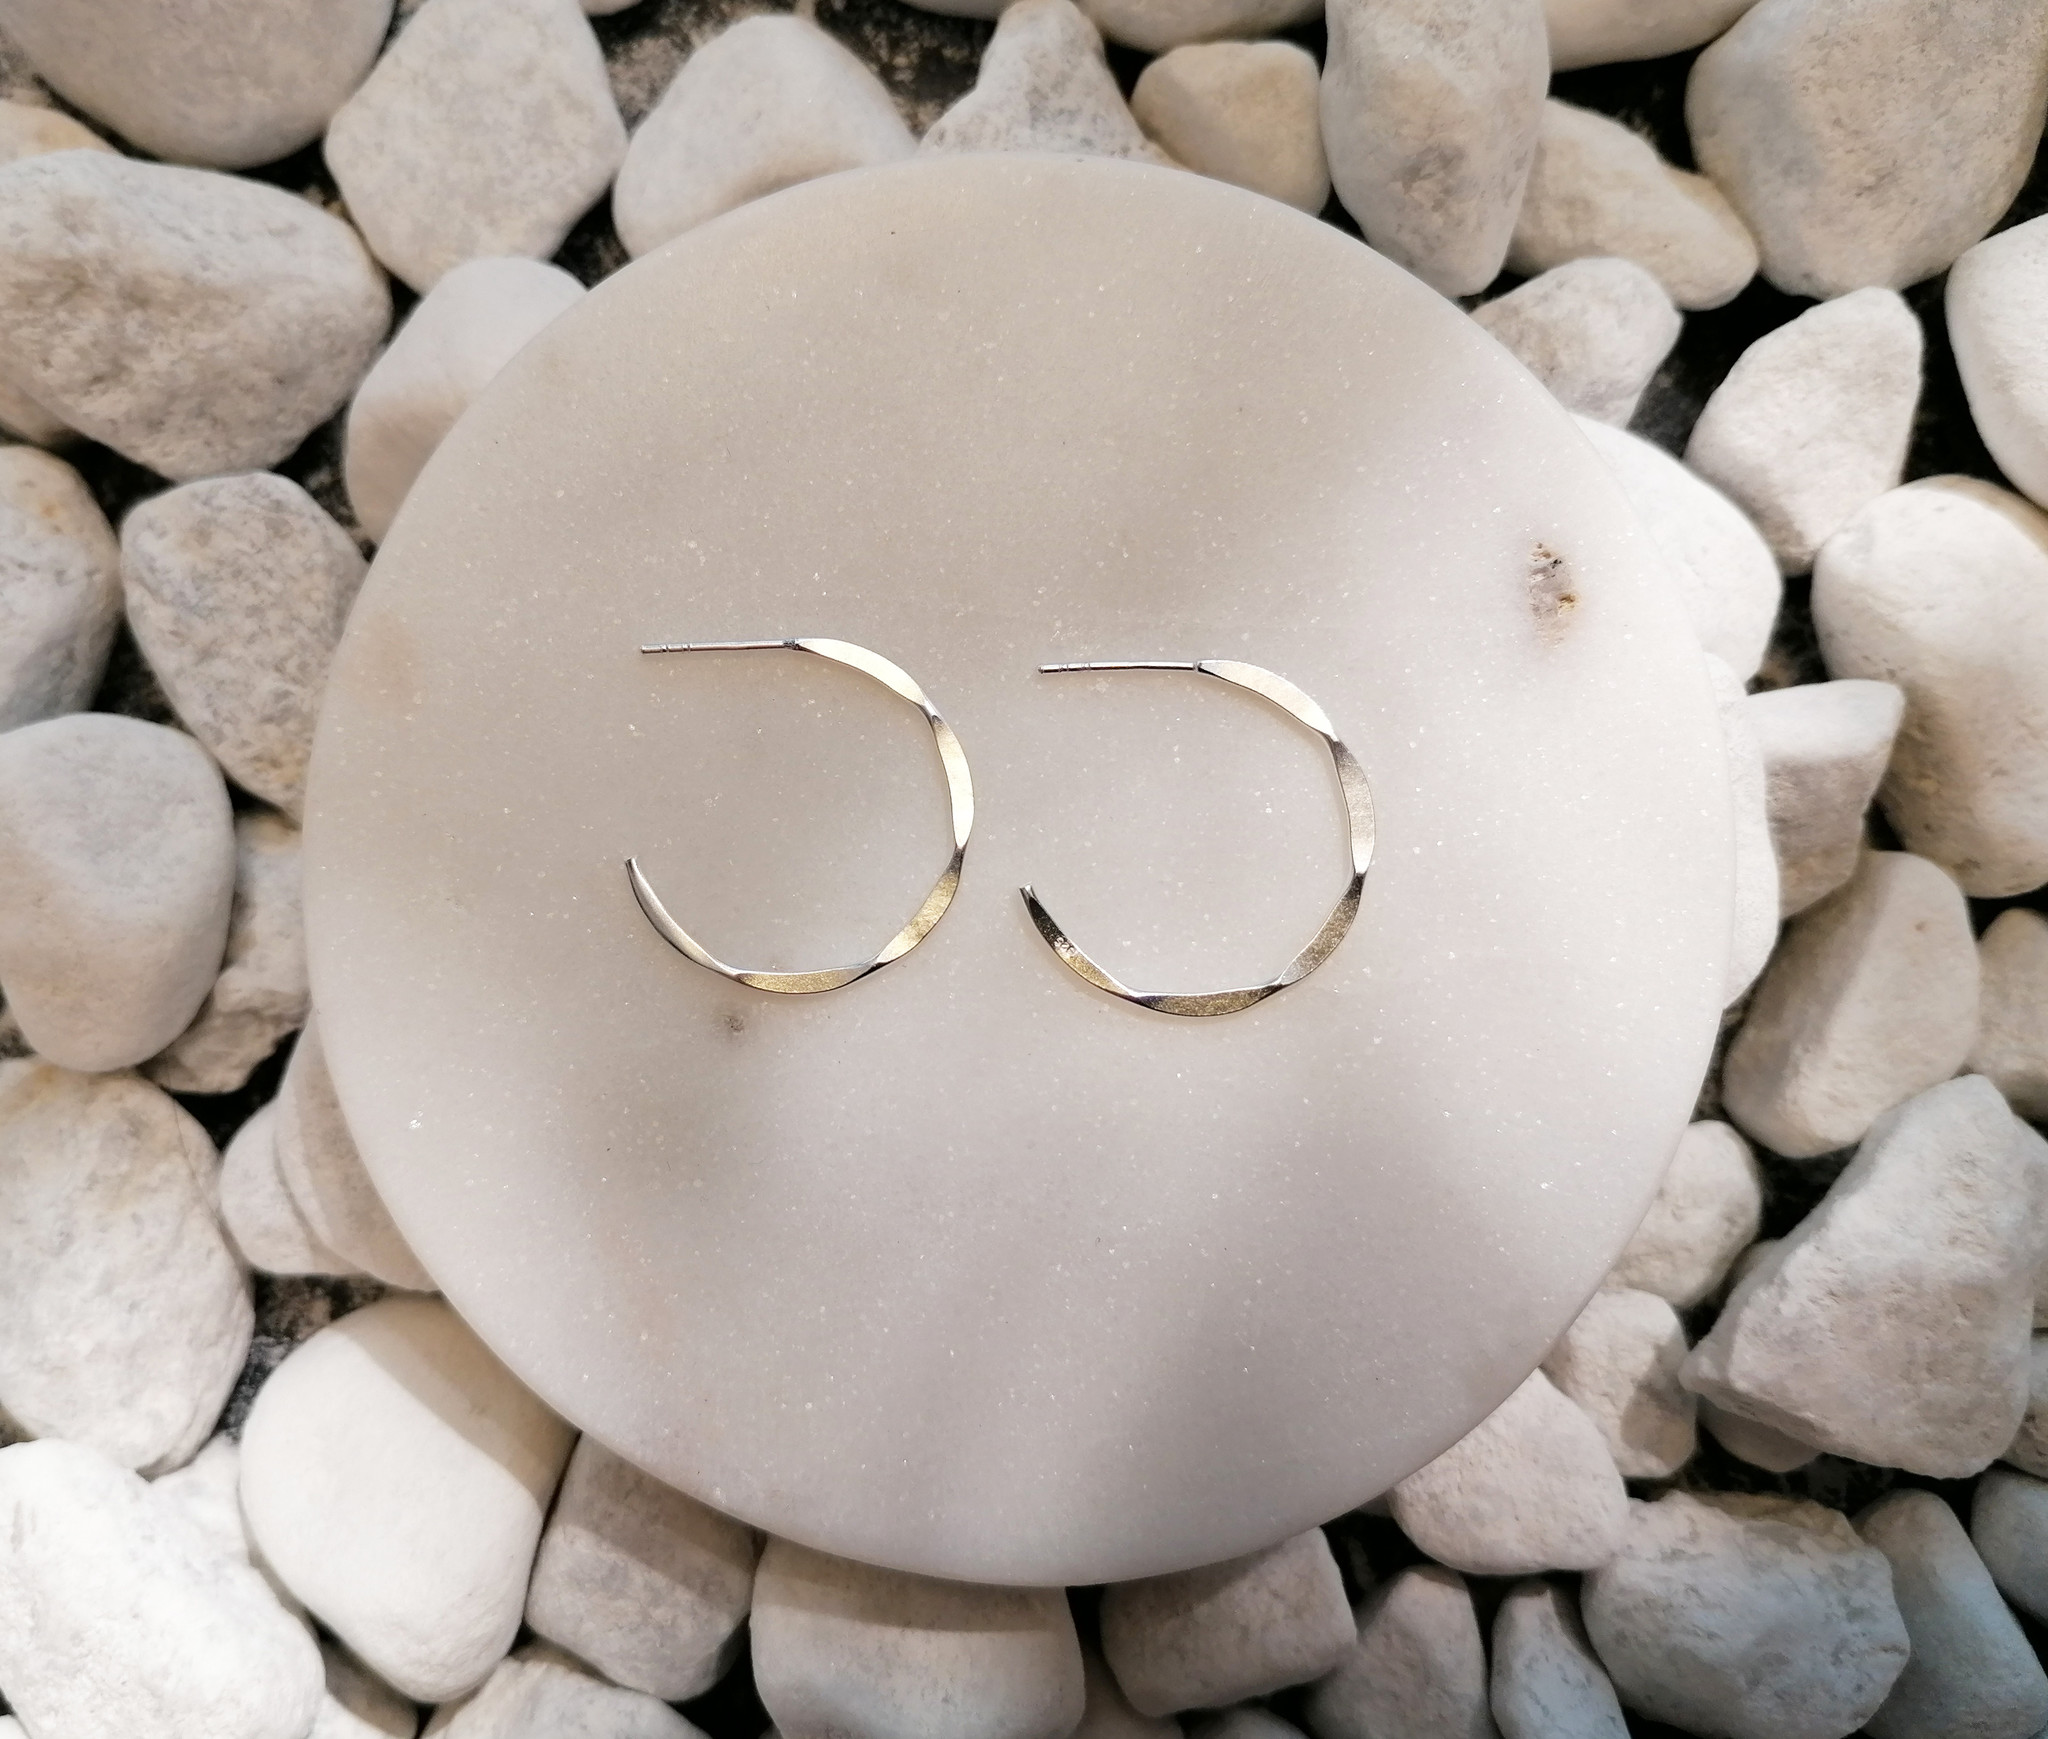 Large Hoop Earrings with texture - 925er Sterling Silver-2